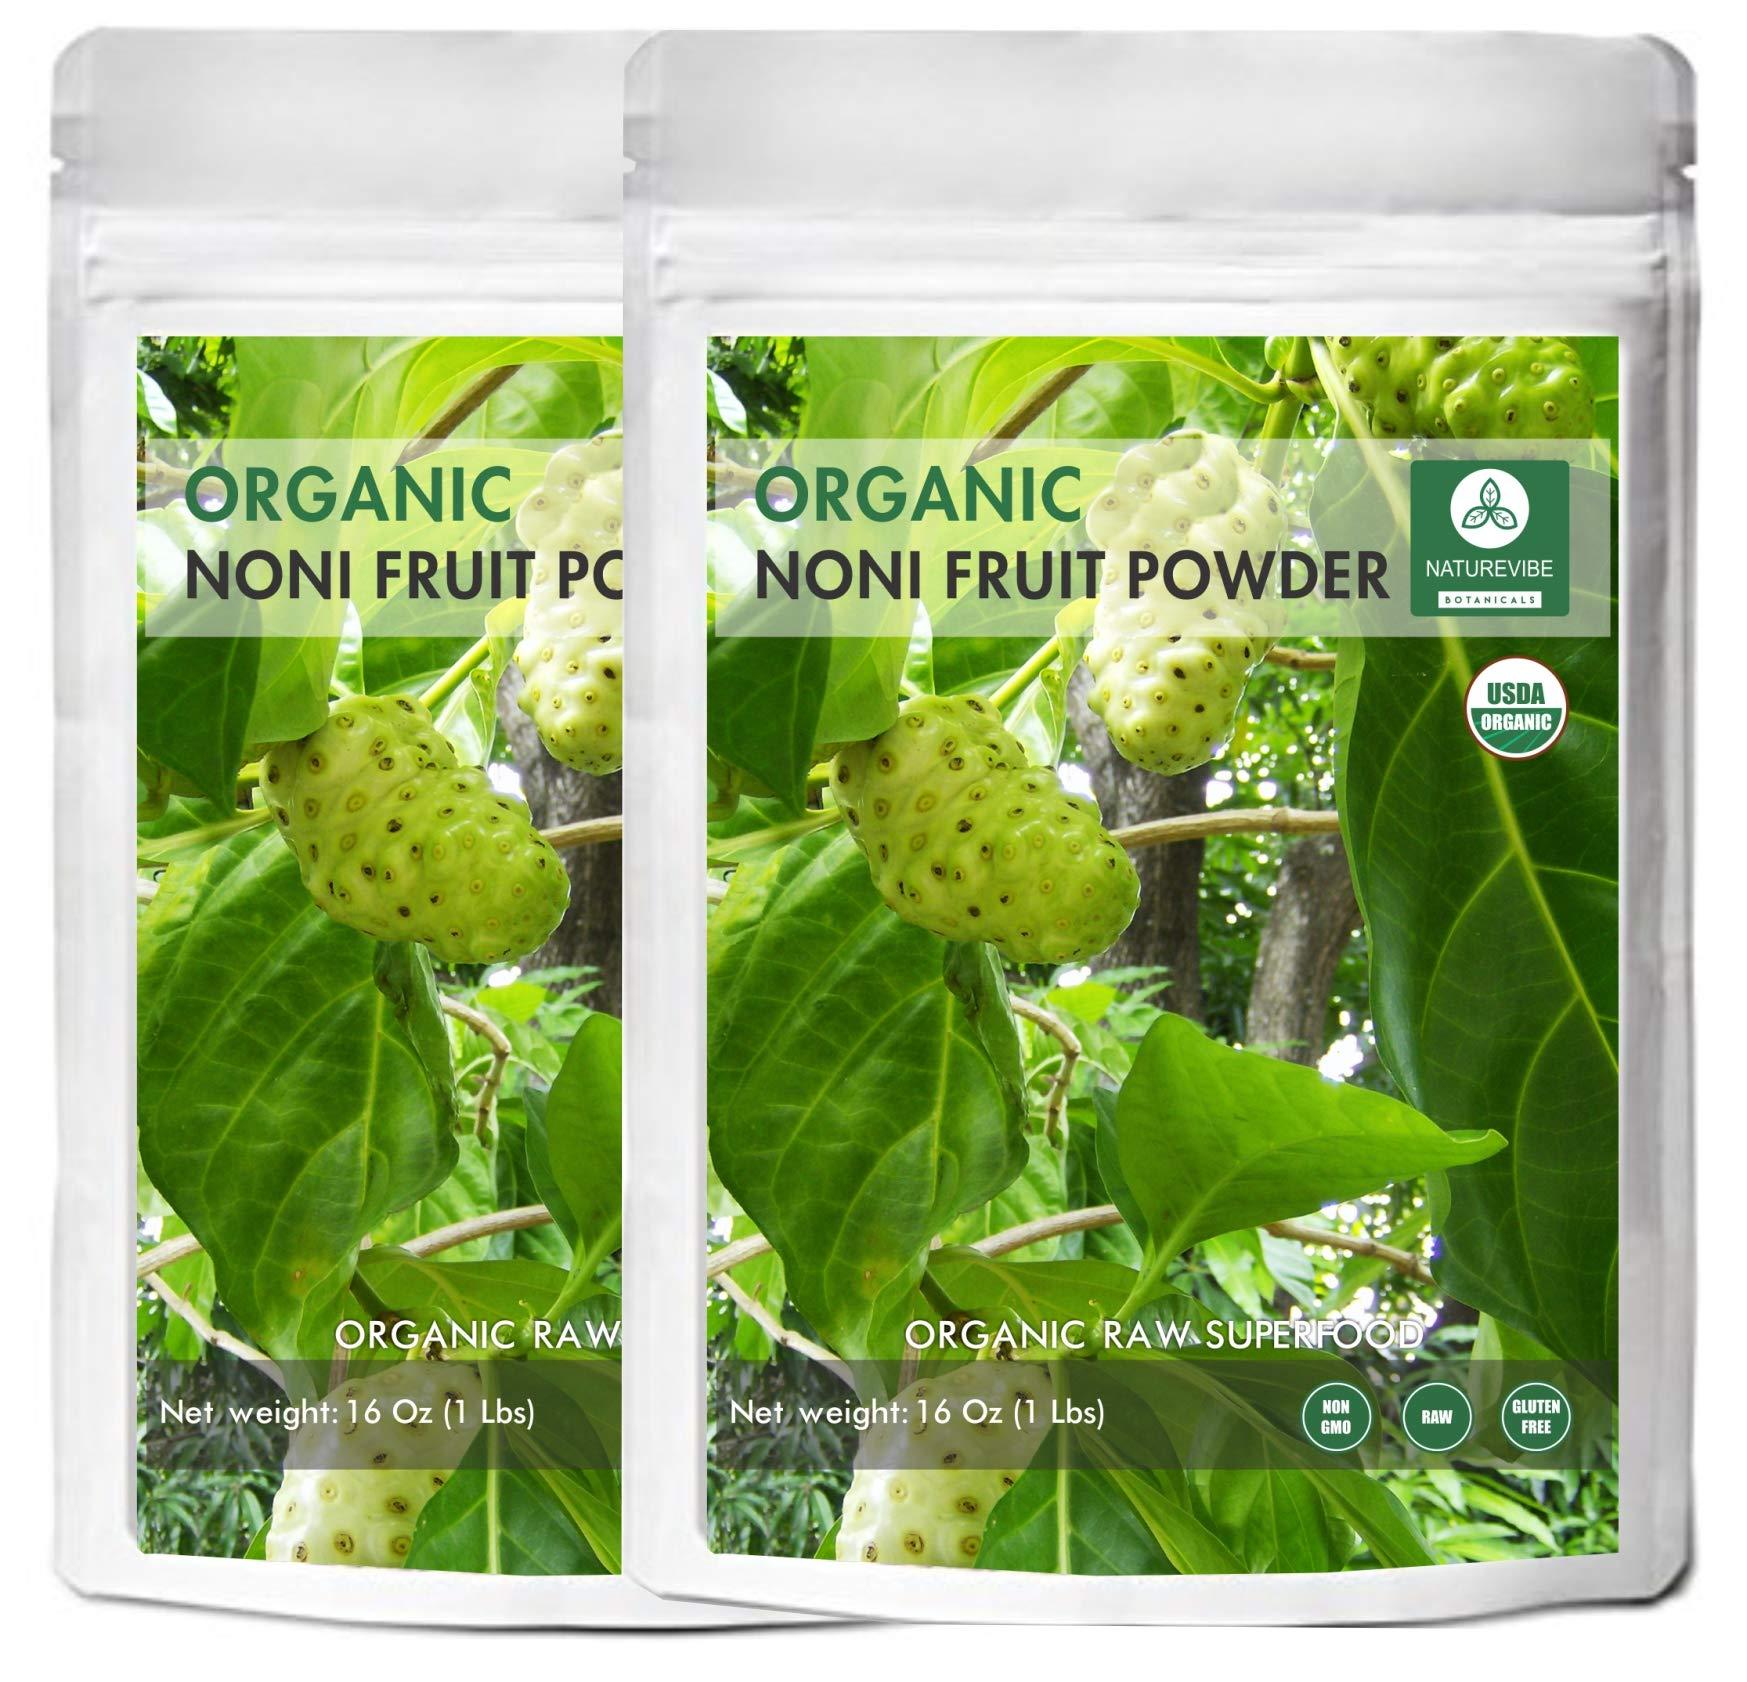 Naturevibe Botanicals USDA Organic Noni Fruit Powder (2lbs) (2 Pack of 1lbs Each) - Morinda Citrifolia by Naturevibe Botanicals